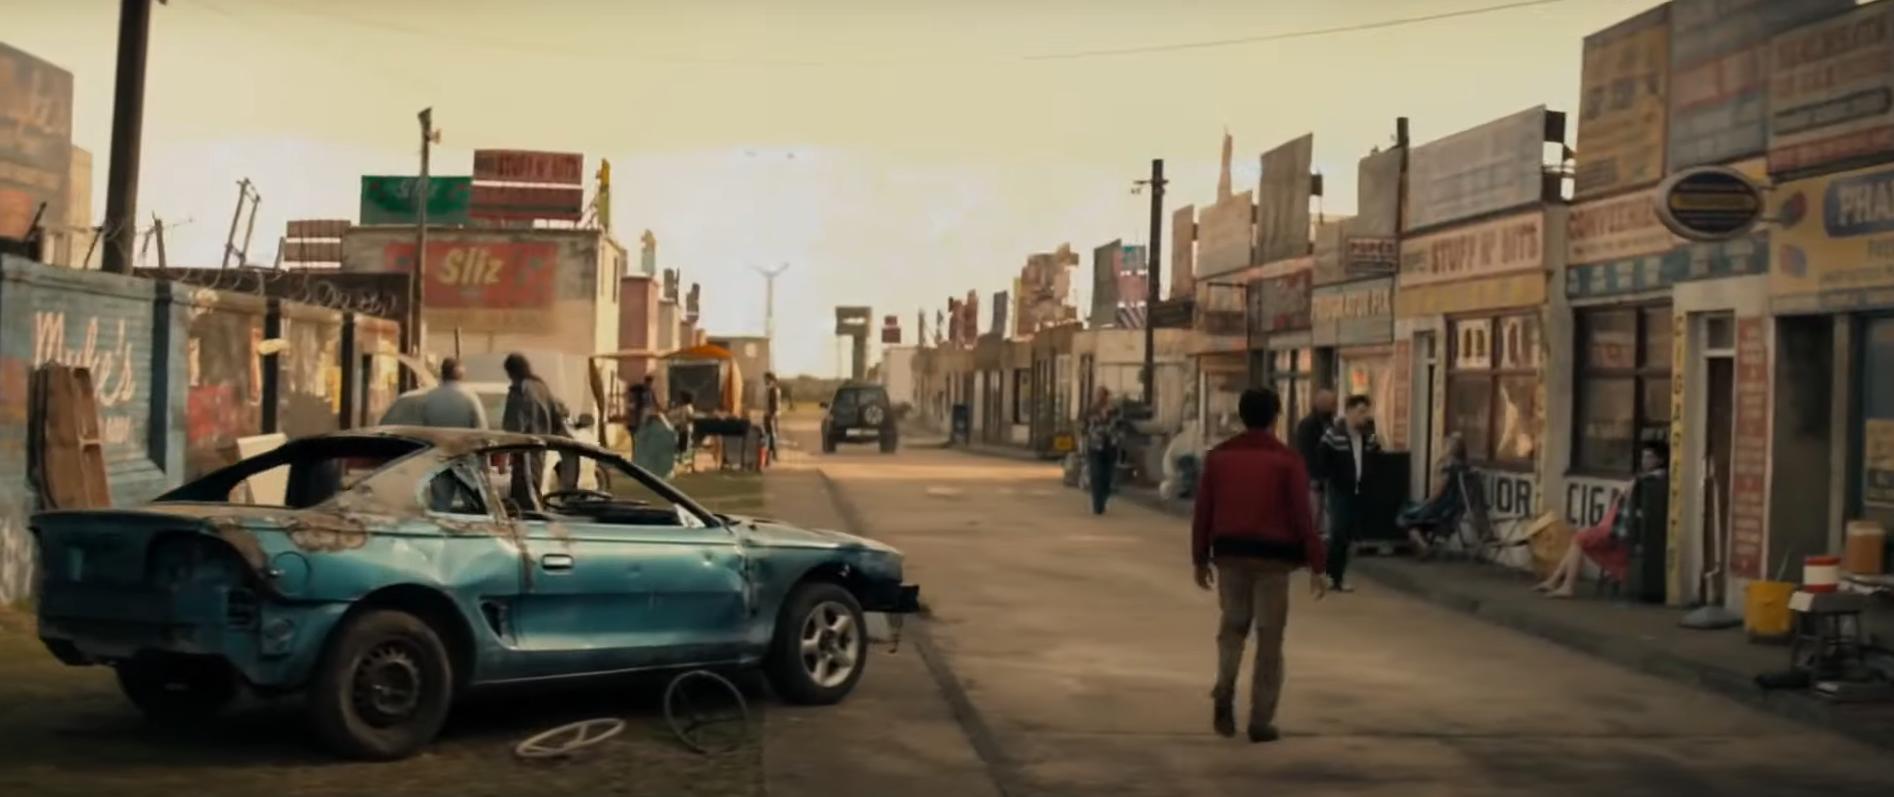 brave new world serie crítica:el planeta feliz que se estrenó en HBO Portugal 2